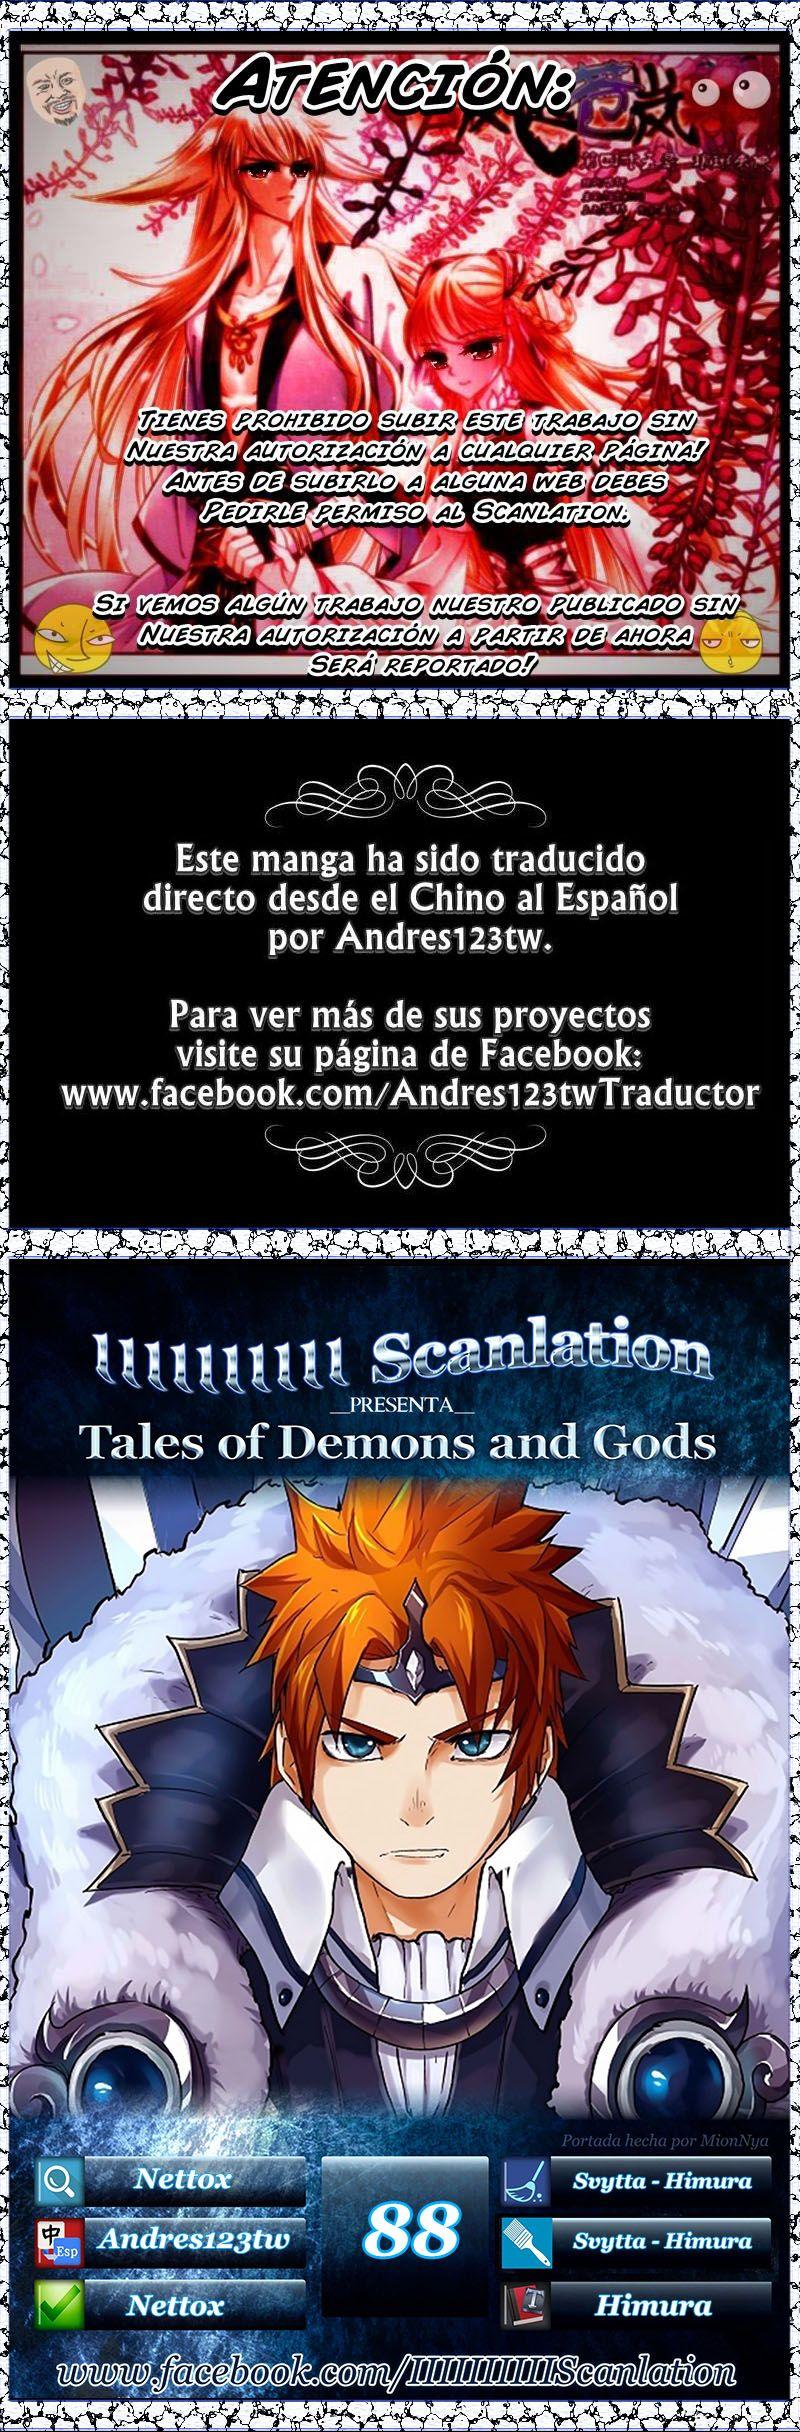 http://c5.ninemanga.com/es_manga/7/17735/483807/77996a155c0768cbe2f5ecd13984163c.jpg Page 1